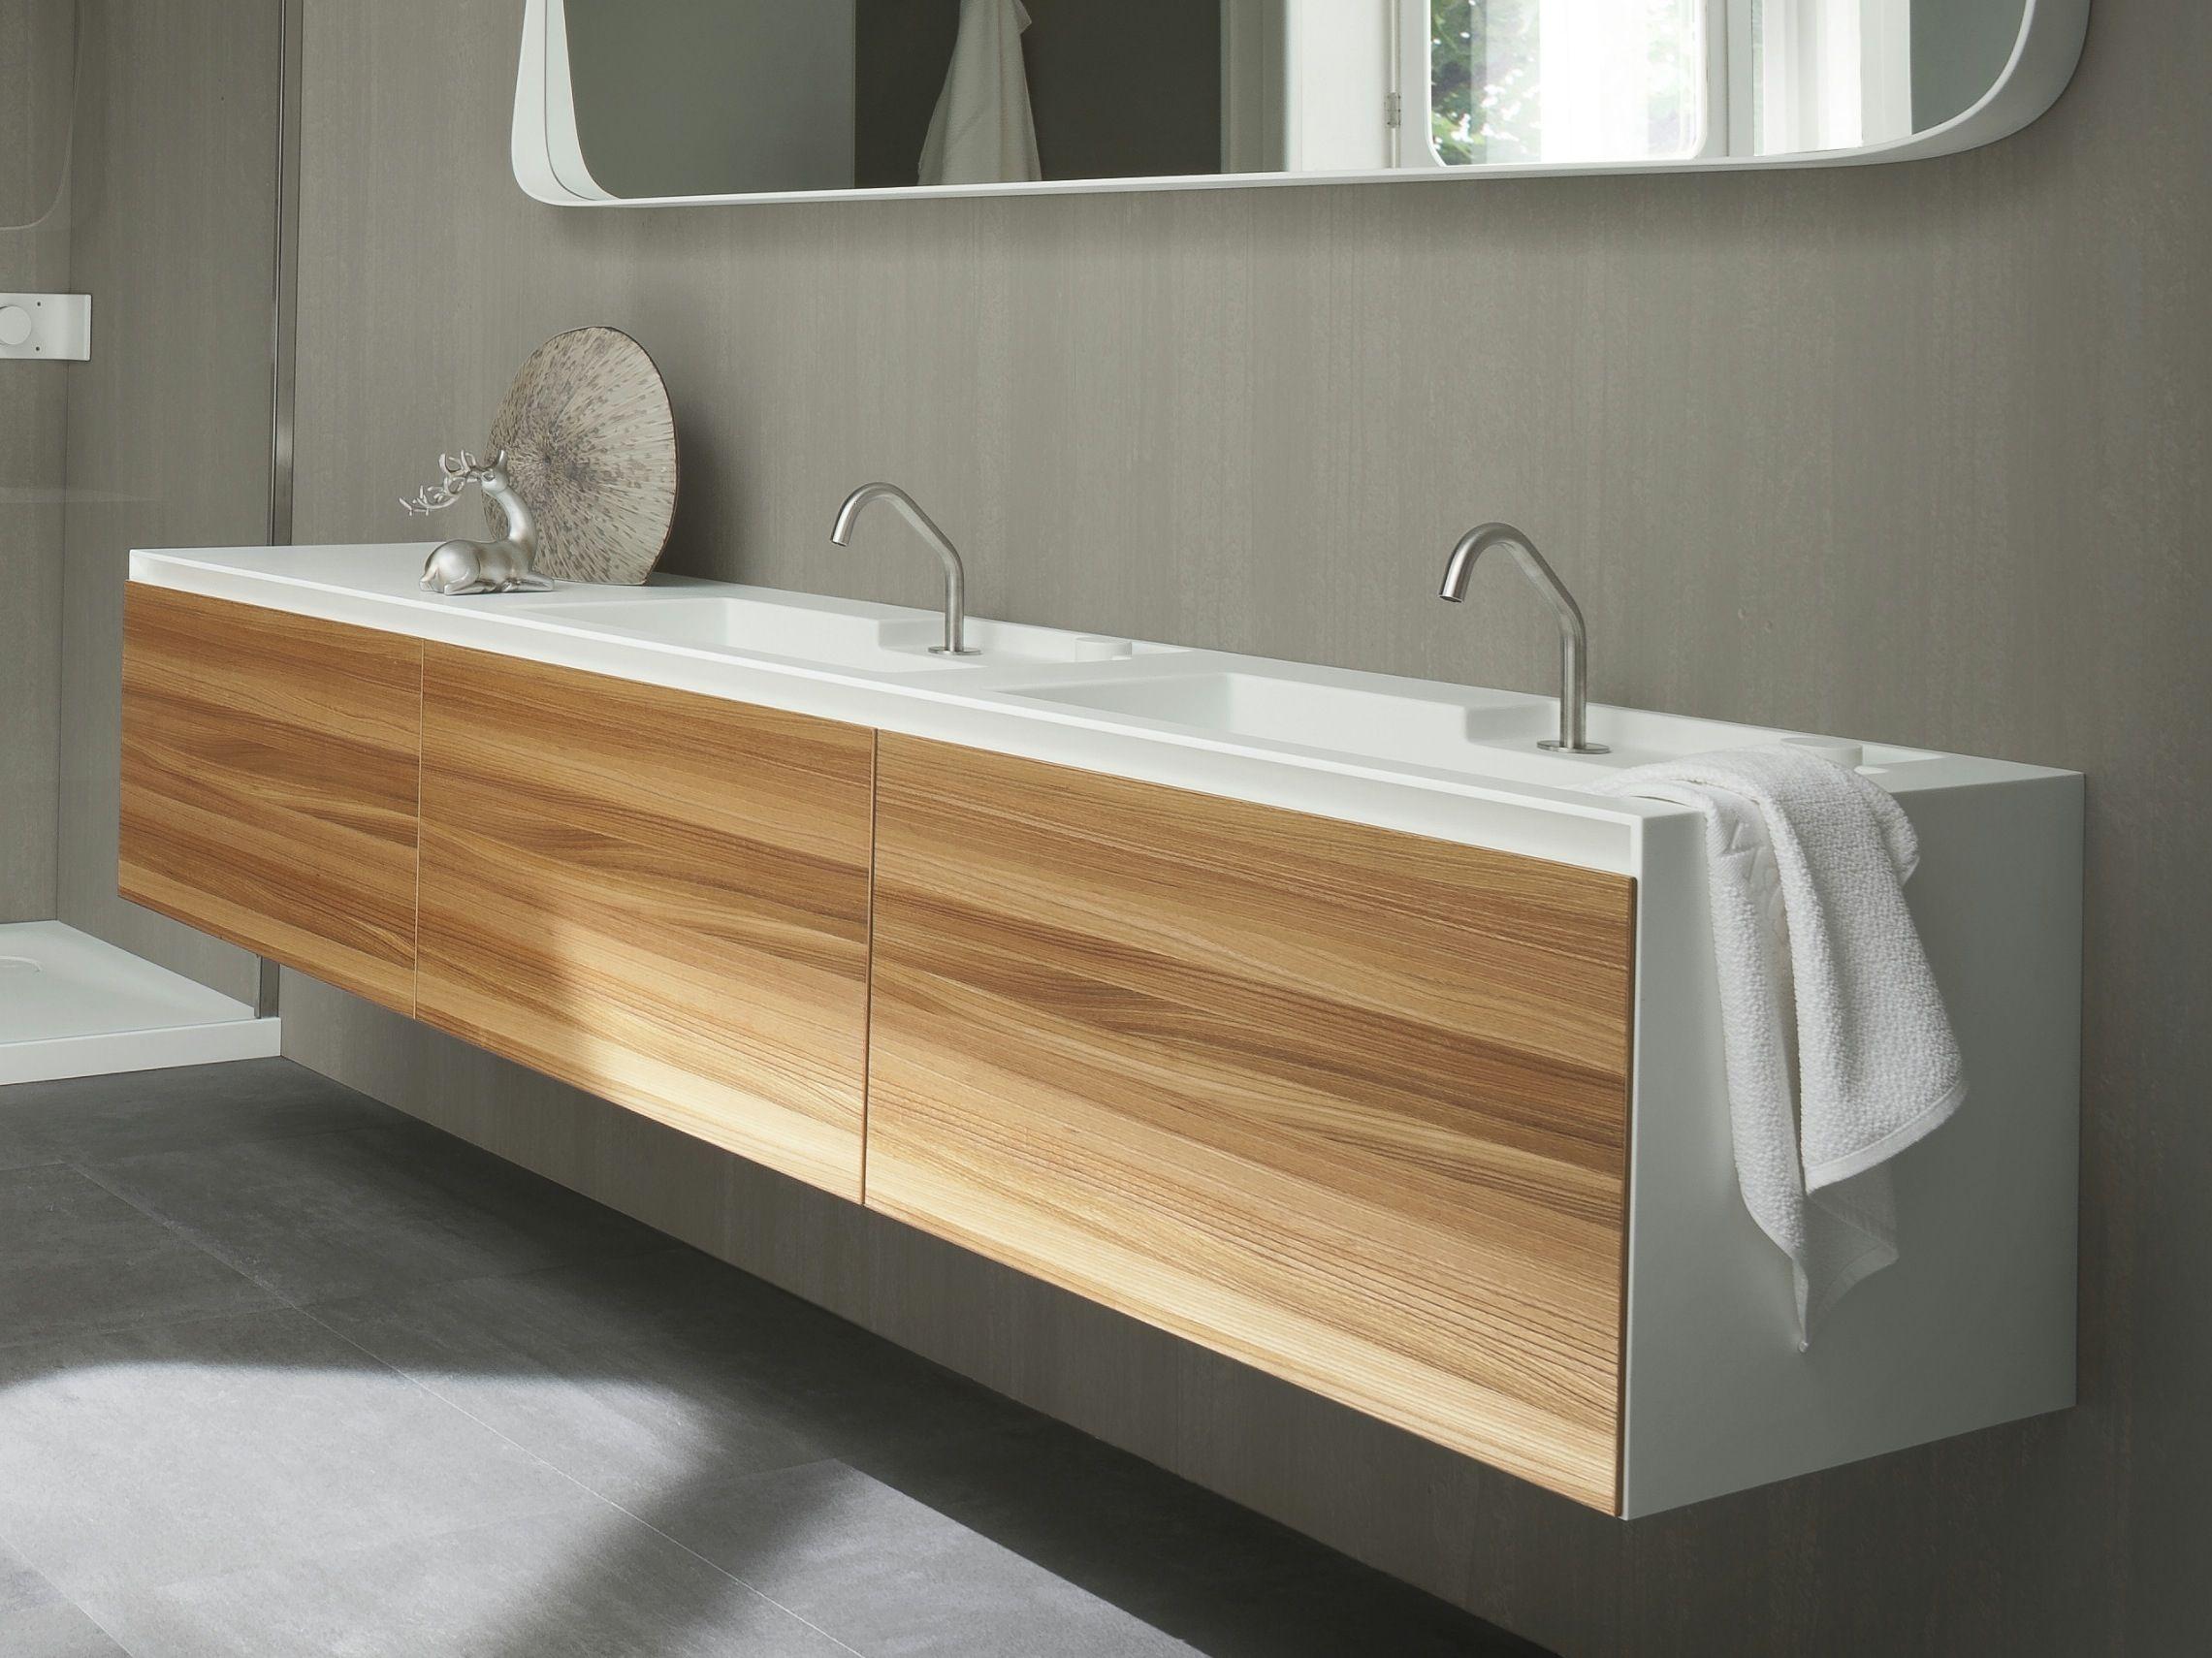 Wastafel corian en hout badkamer pinterest badkamer badkamers